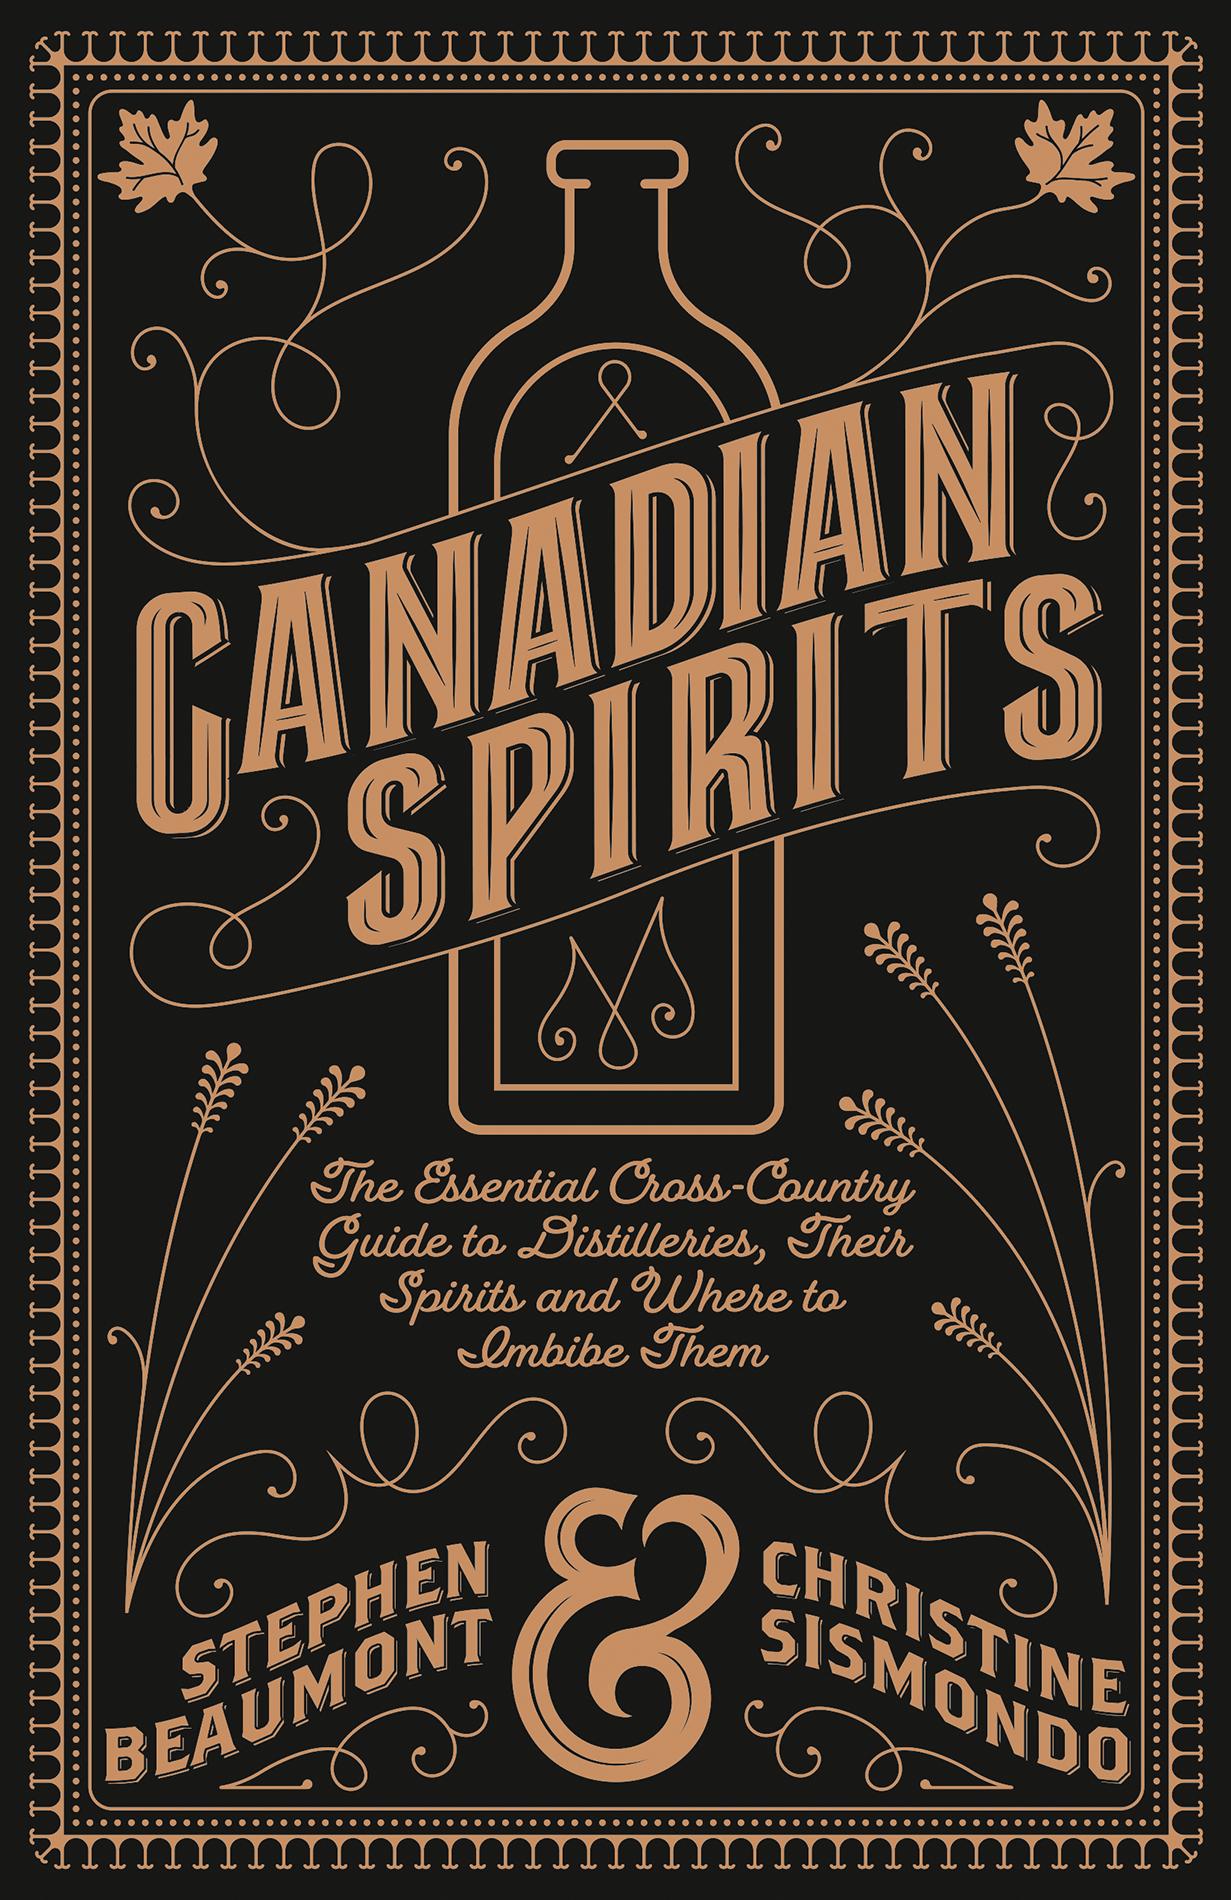 Canadian Spirits